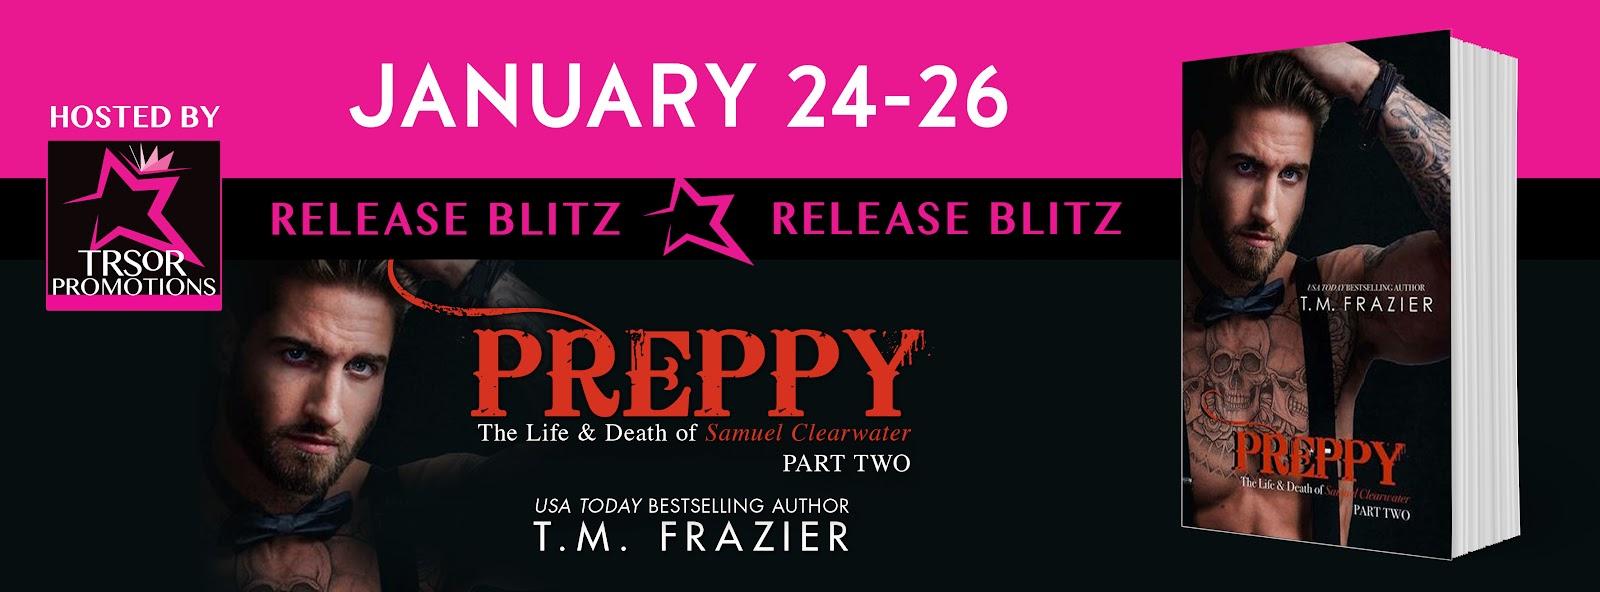 PREPPY_PARTTWO_RELEASE_BLITZ.jpg